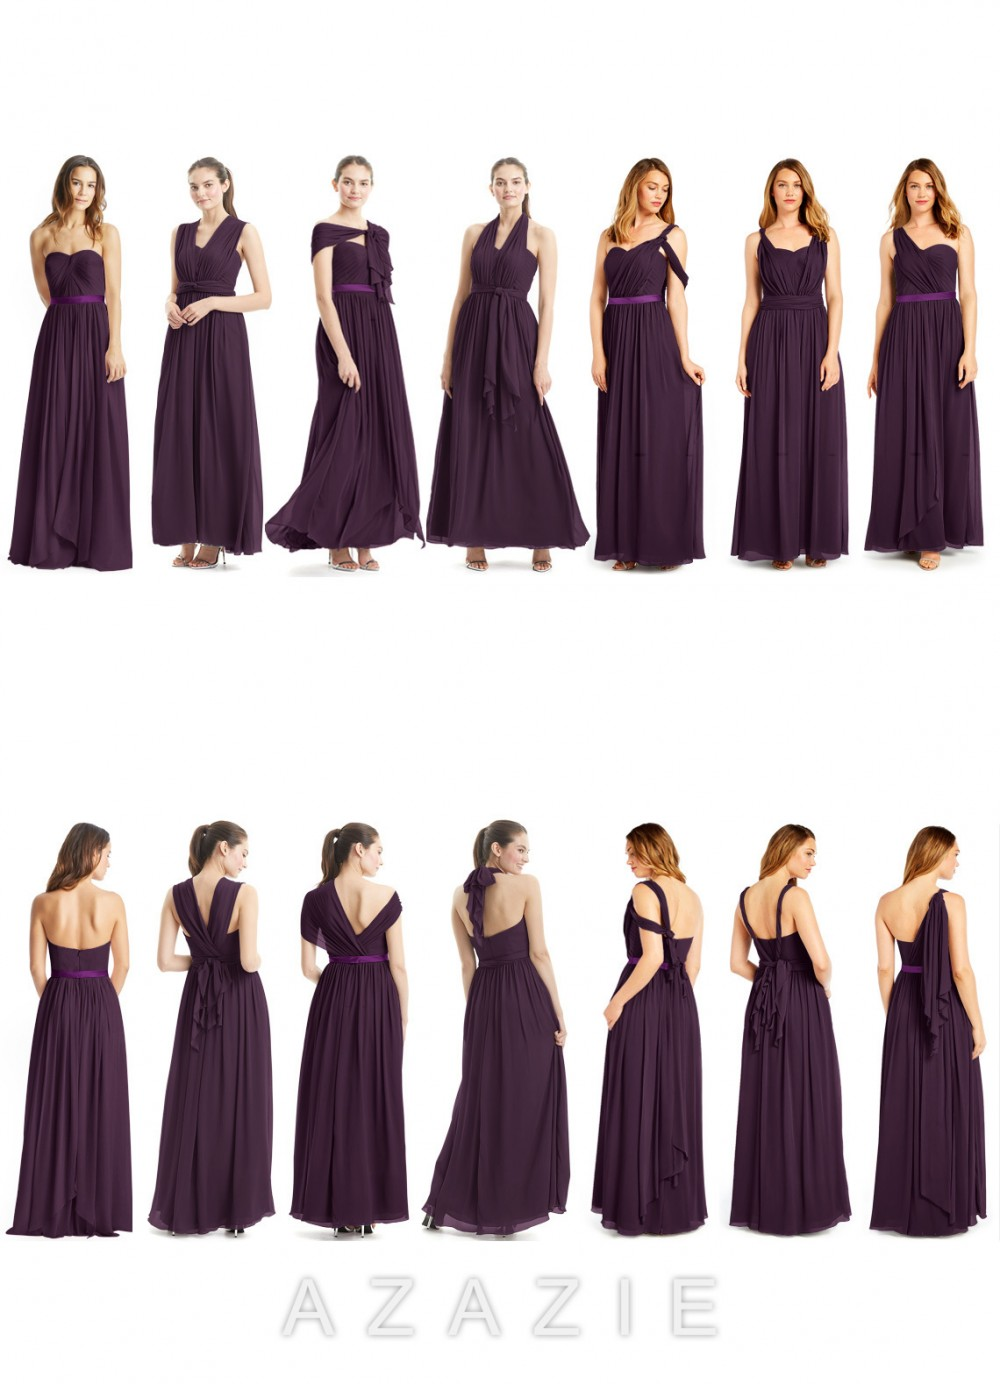 Azazie Stella convertible dress